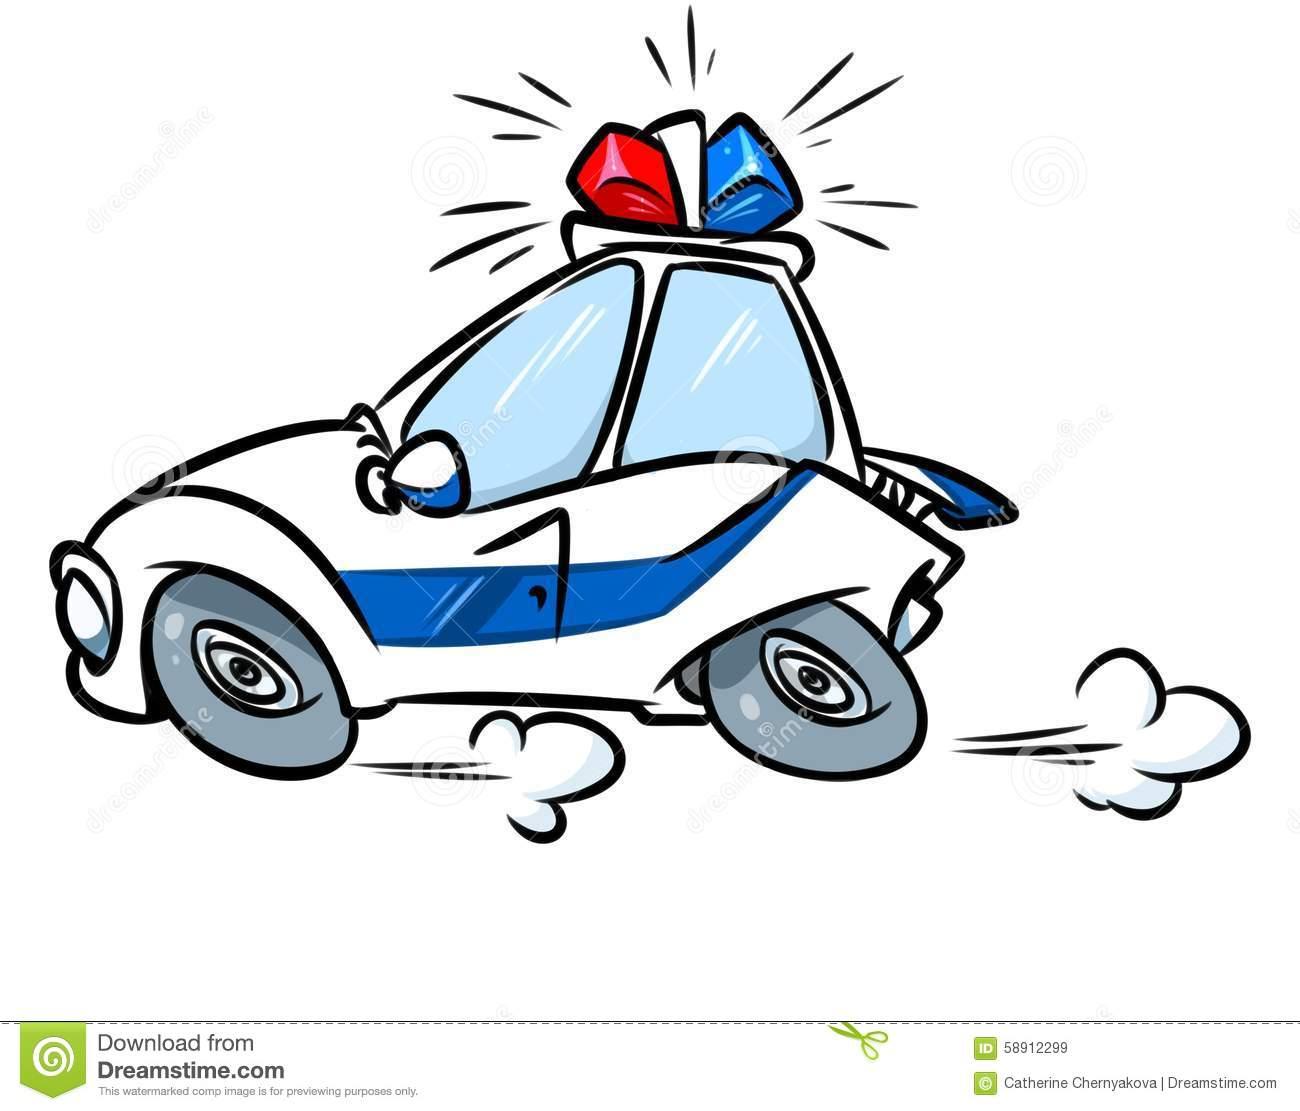 Police car cartoon clipart clip royalty free download Police car chase clipart - ClipartFest clip royalty free download